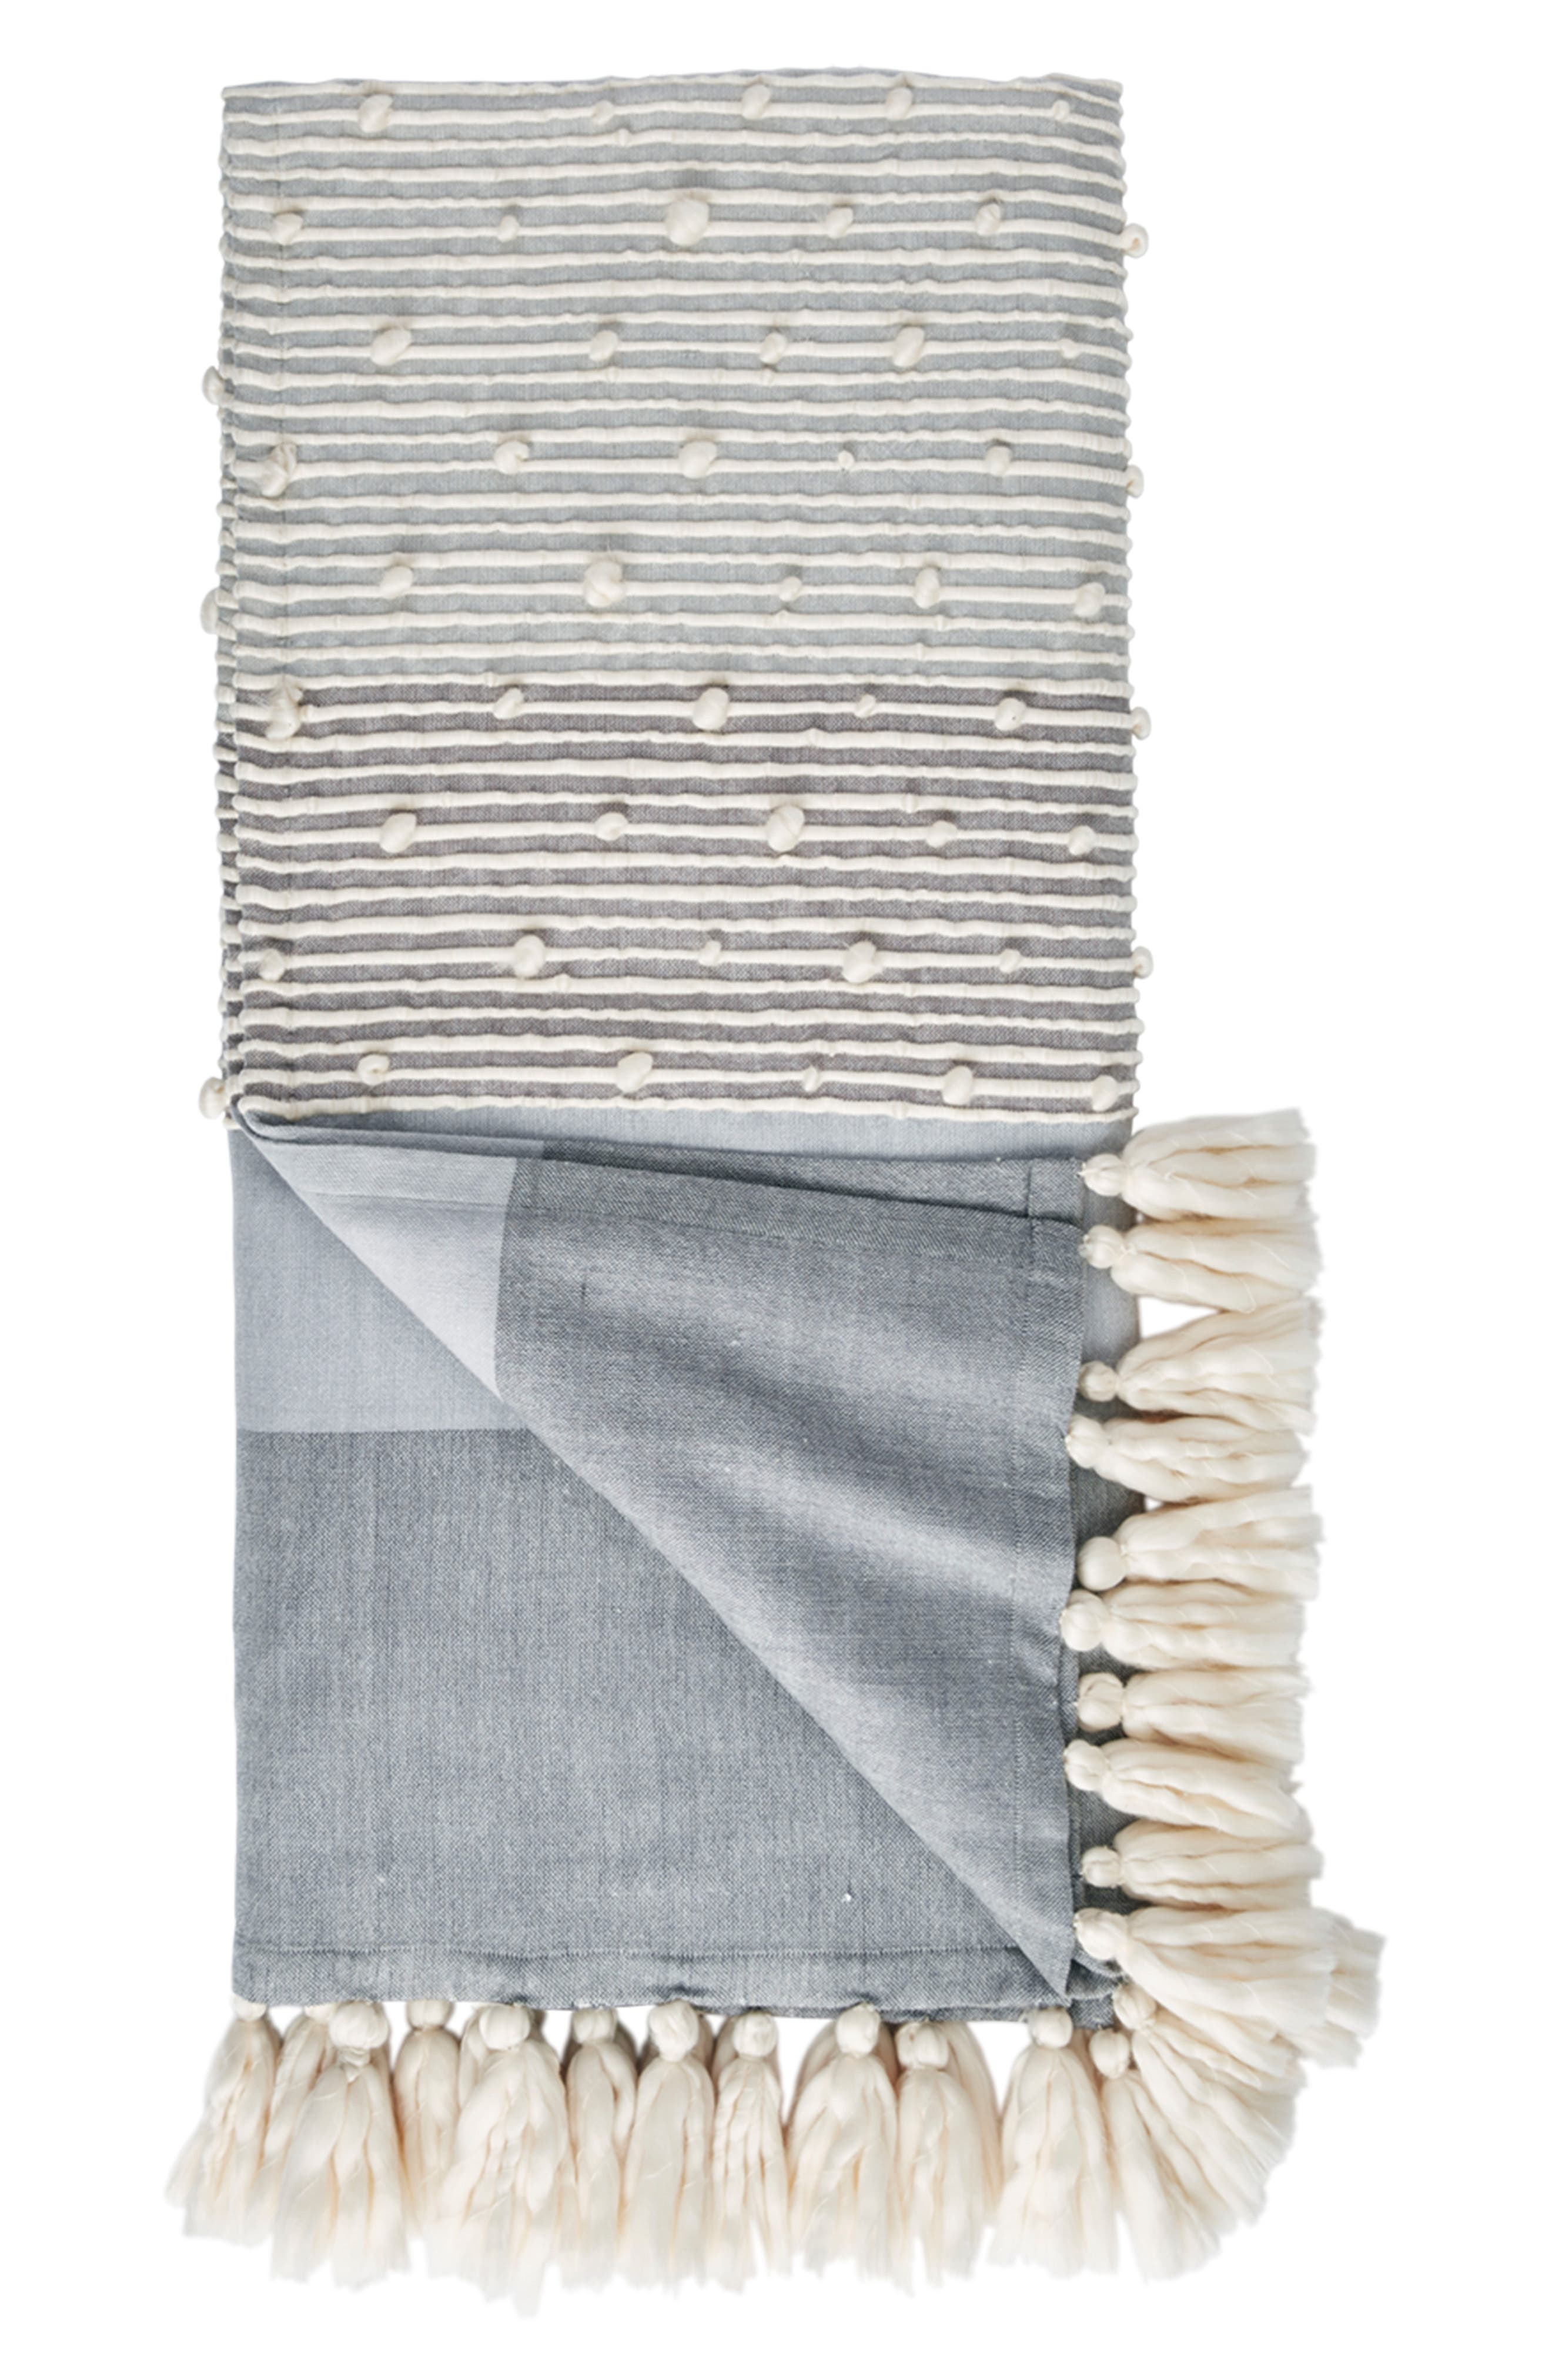 Alternate Image 1 Selected - DwellStudio Tallulah Throw Blanket